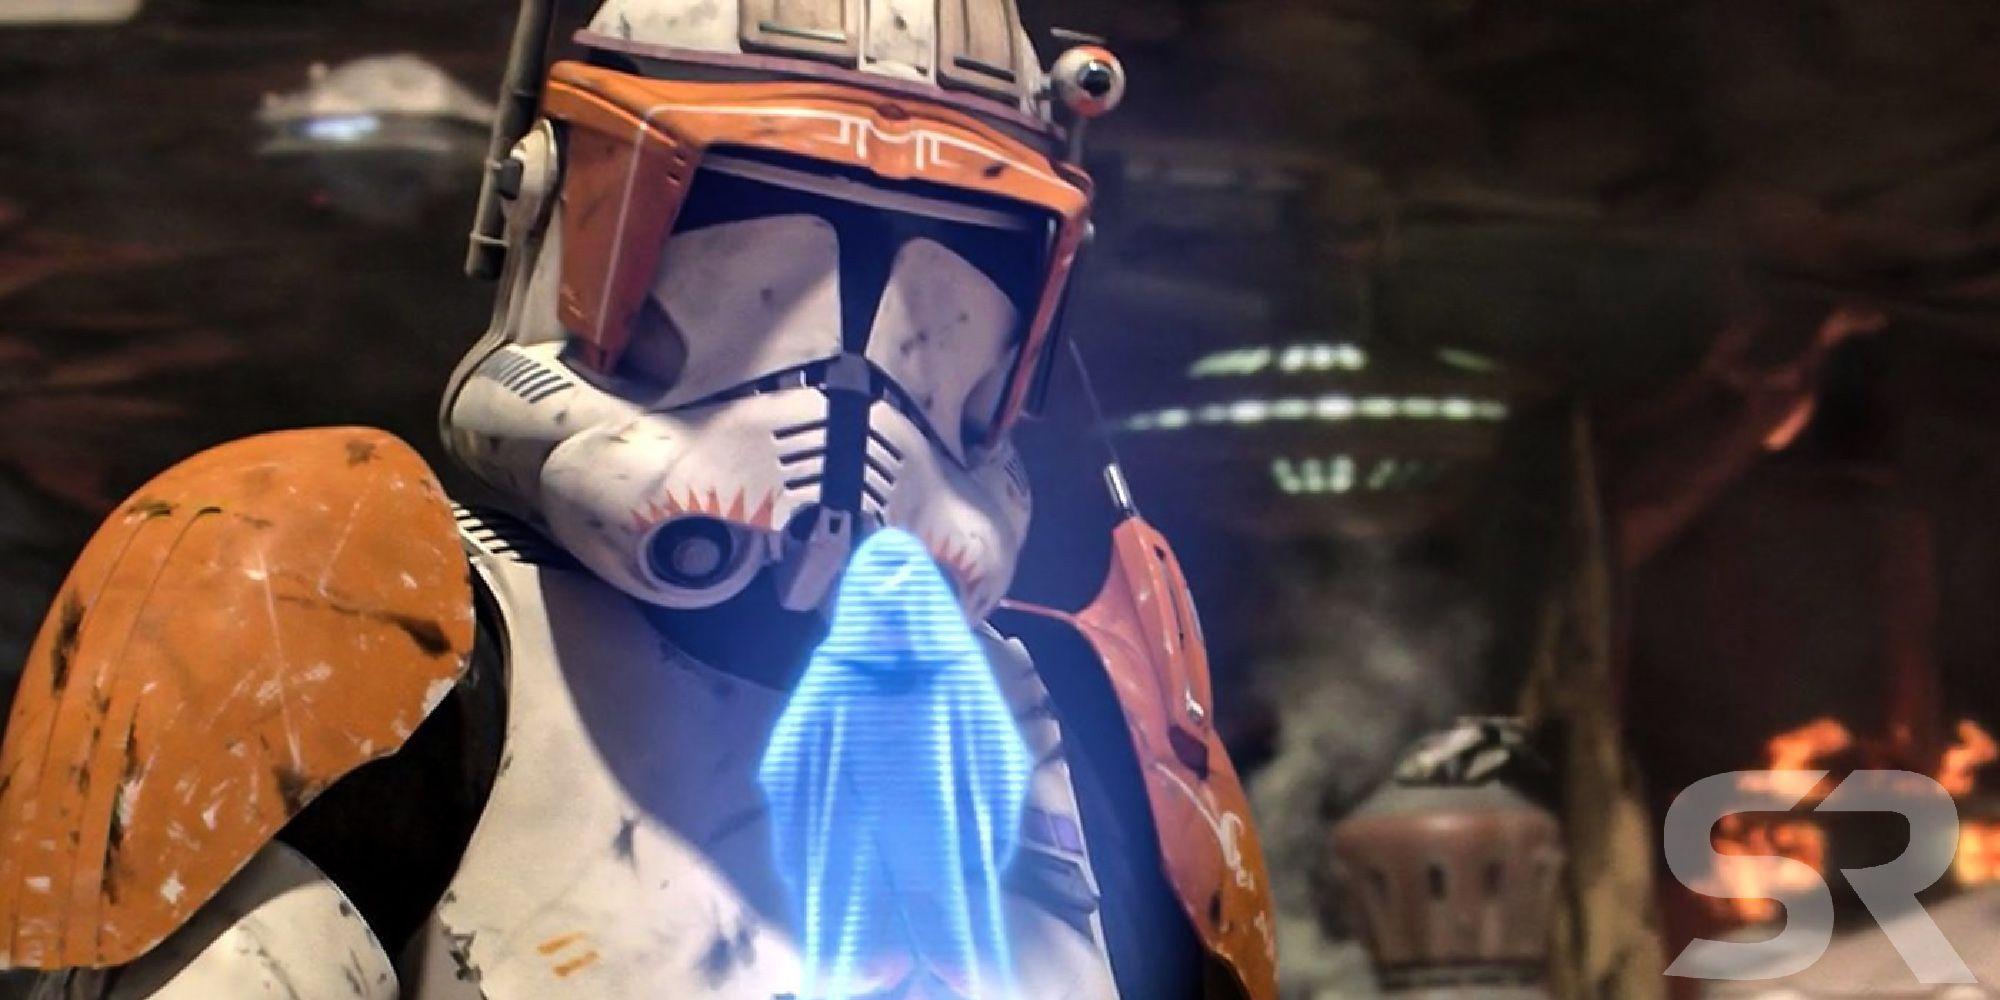 Star Wars revela que Yoda sabia que os clones matariam os Jedi 1